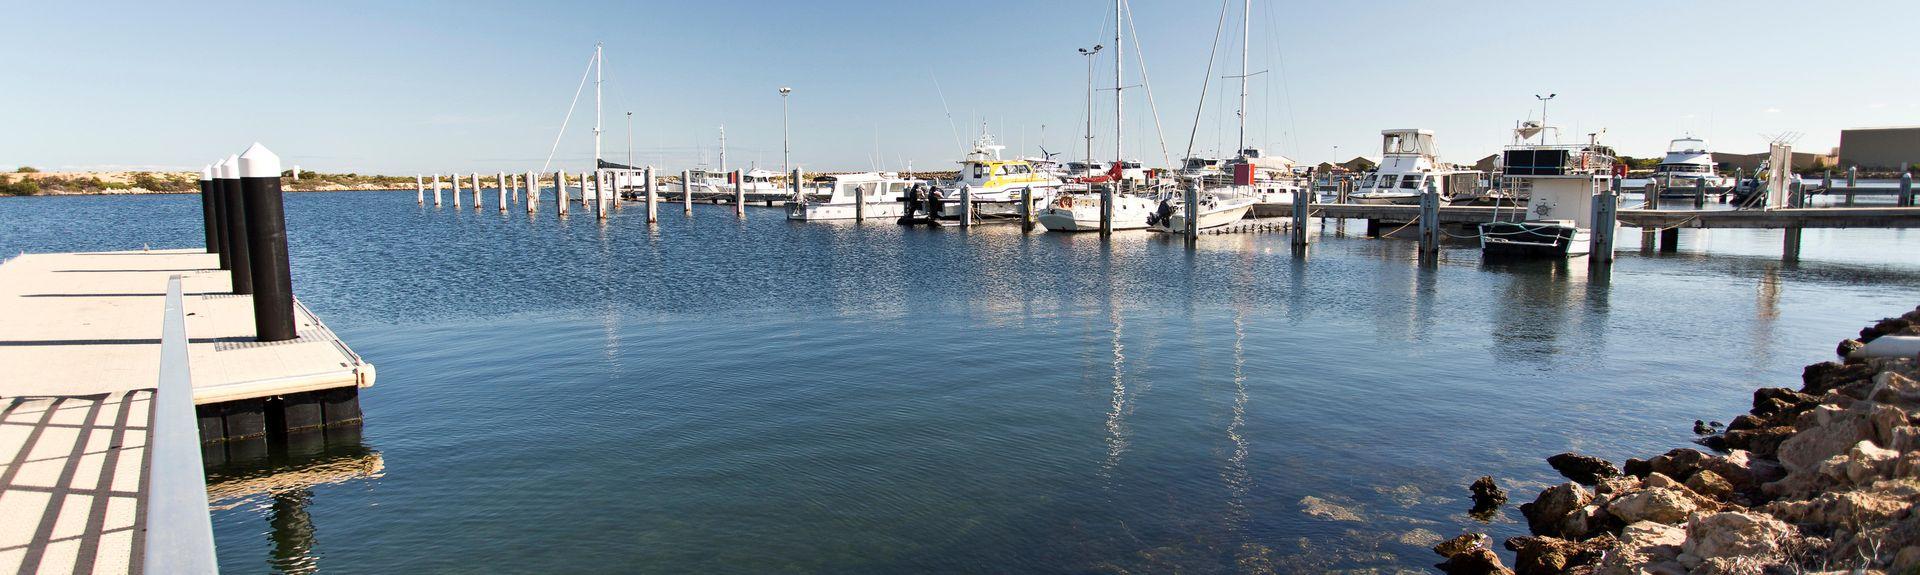 Jurien Bay, Western Australia, Australia